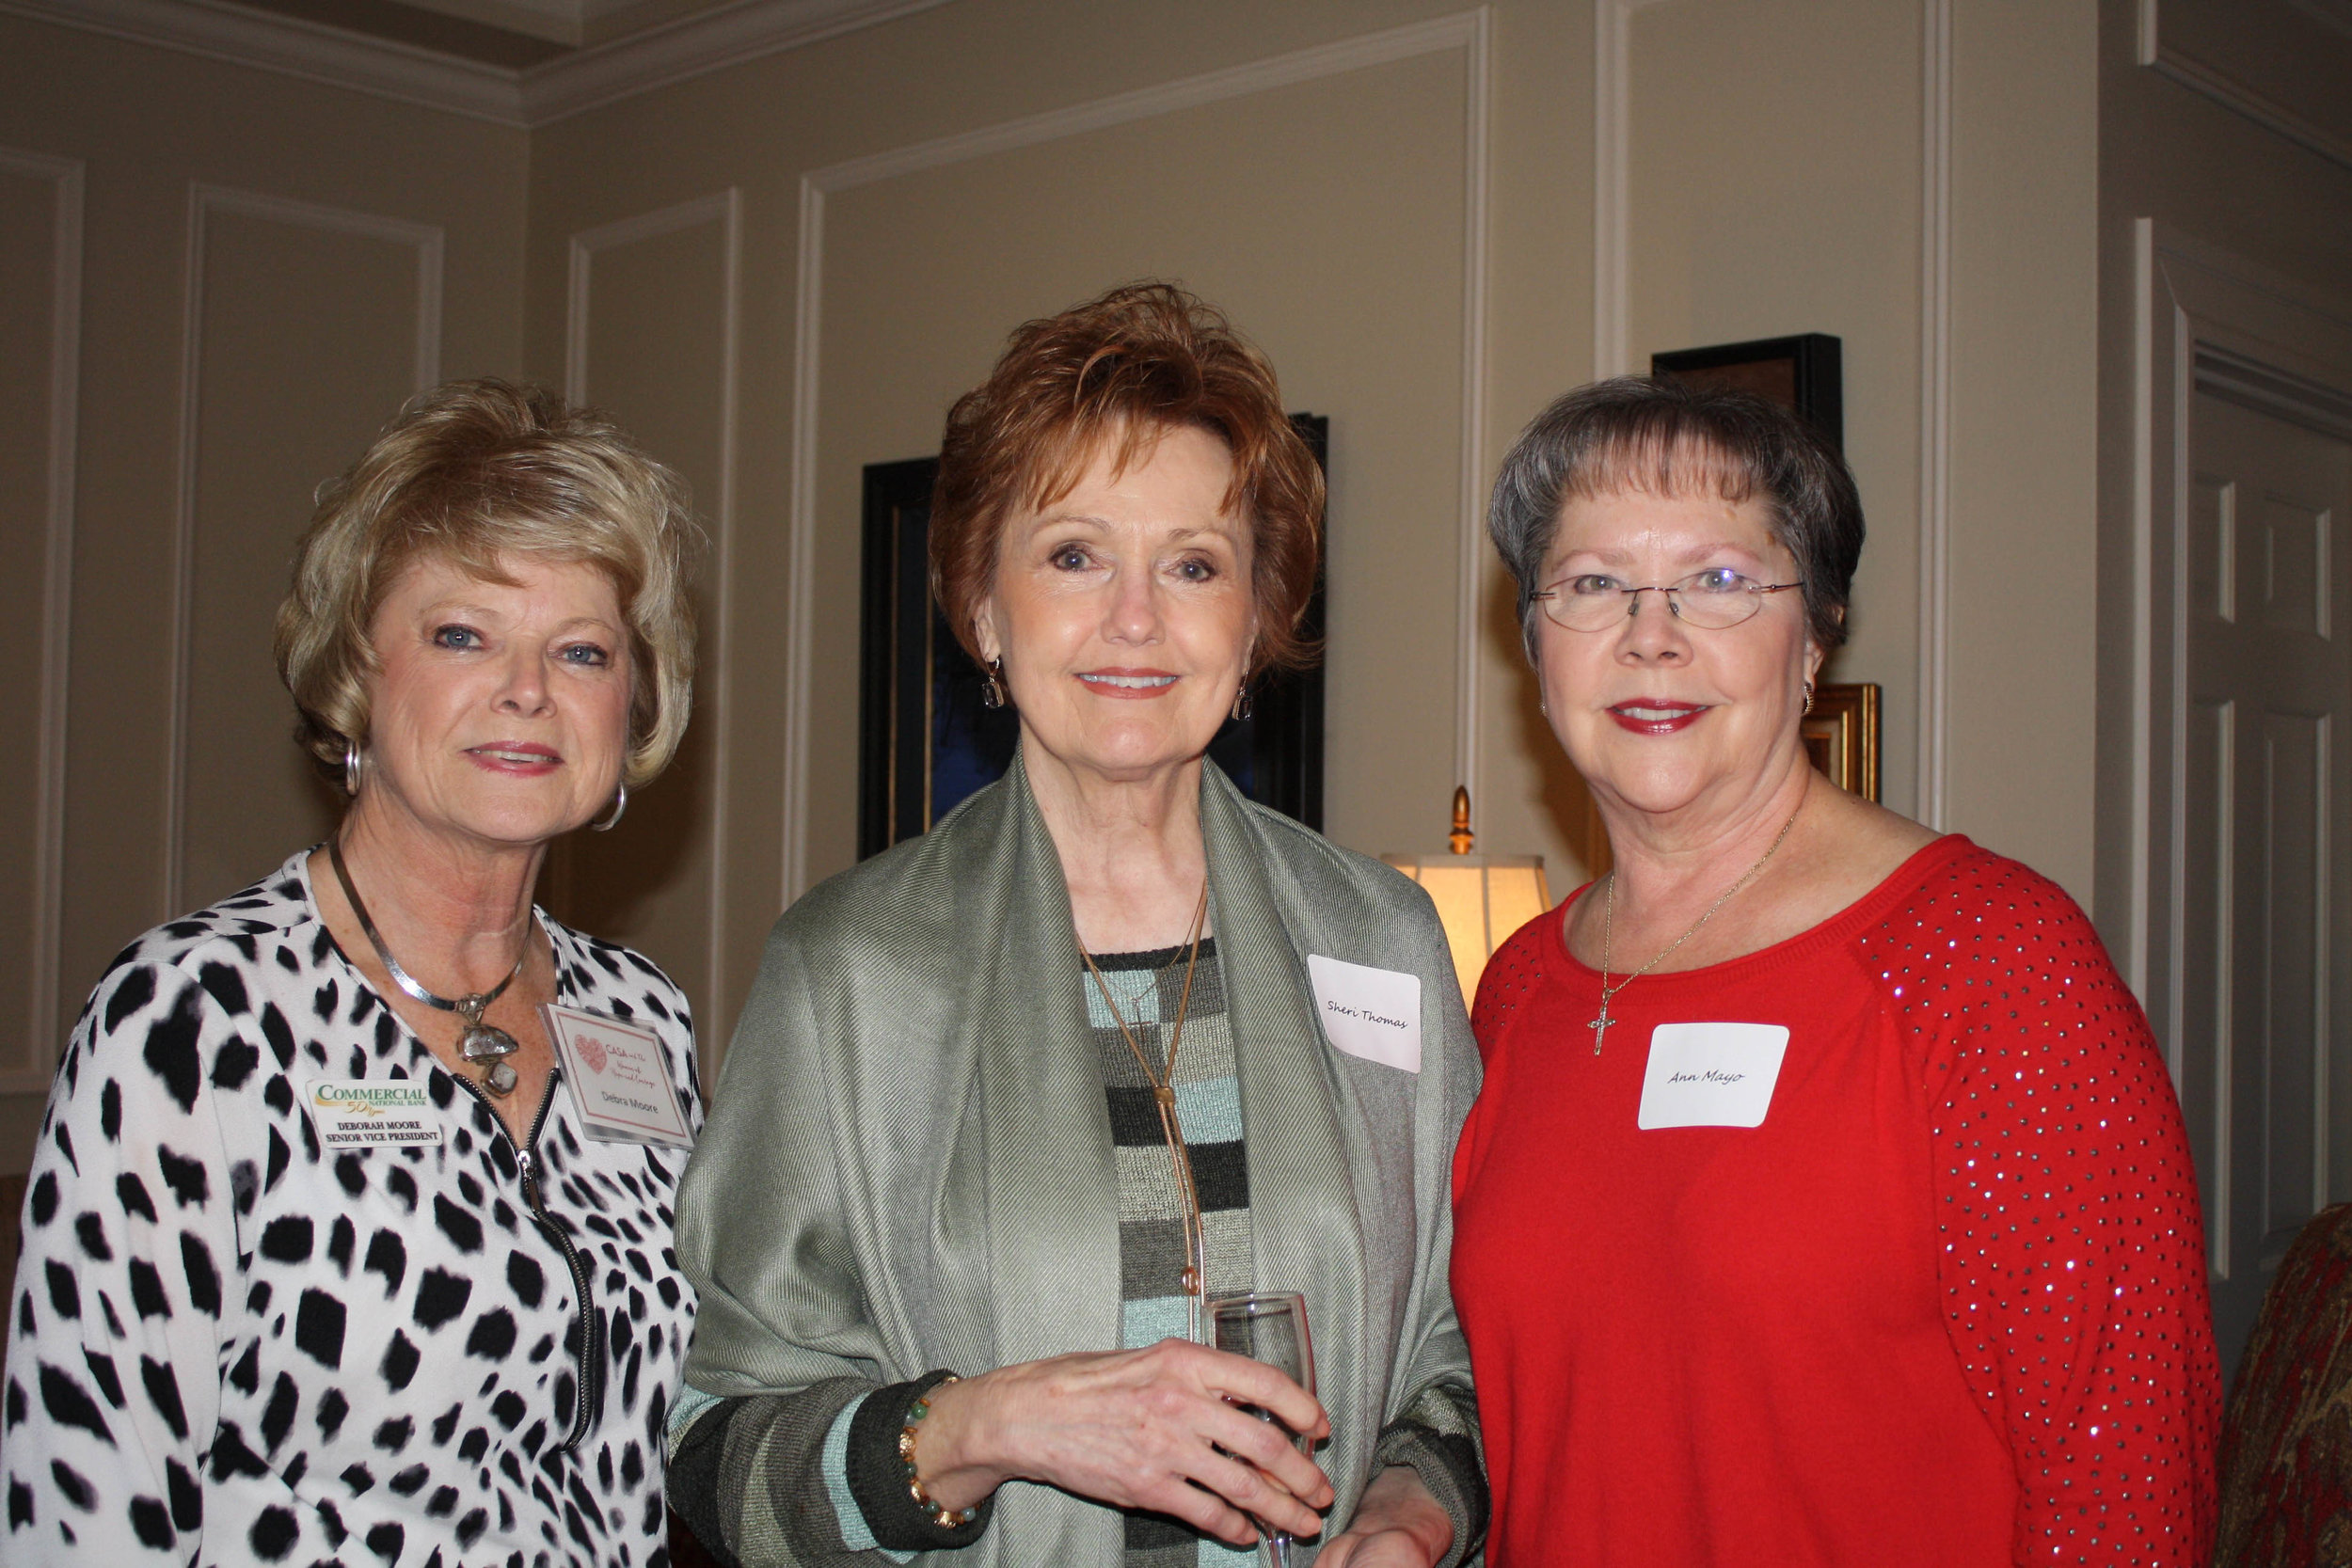 Debra Moore, Sheri Thomas and Ann Mayo